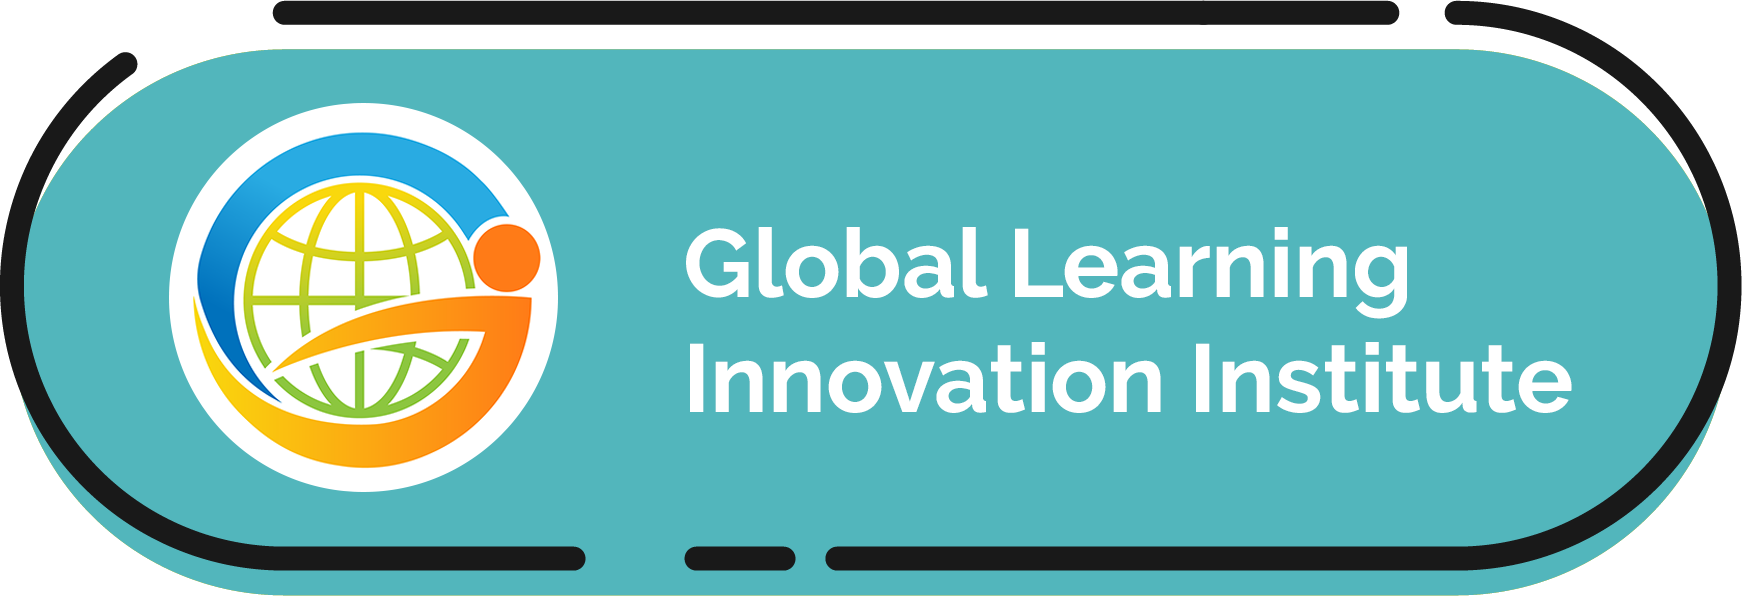 global learning innovation institute